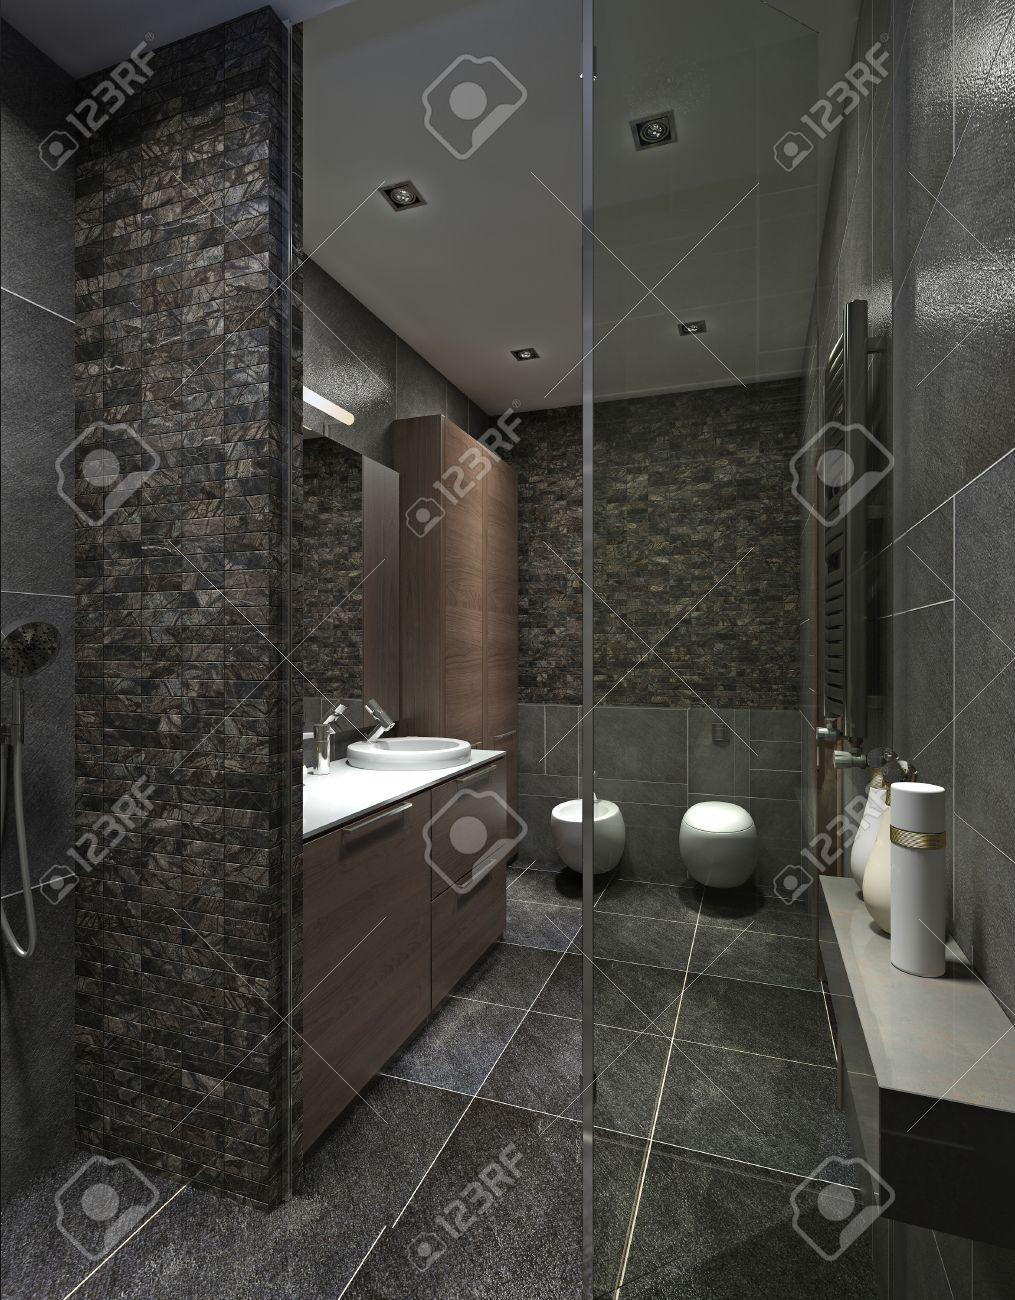 Moderne Badkamer In Zwart Tegels, Mozaïek En Bruin Meubilair. Met ...